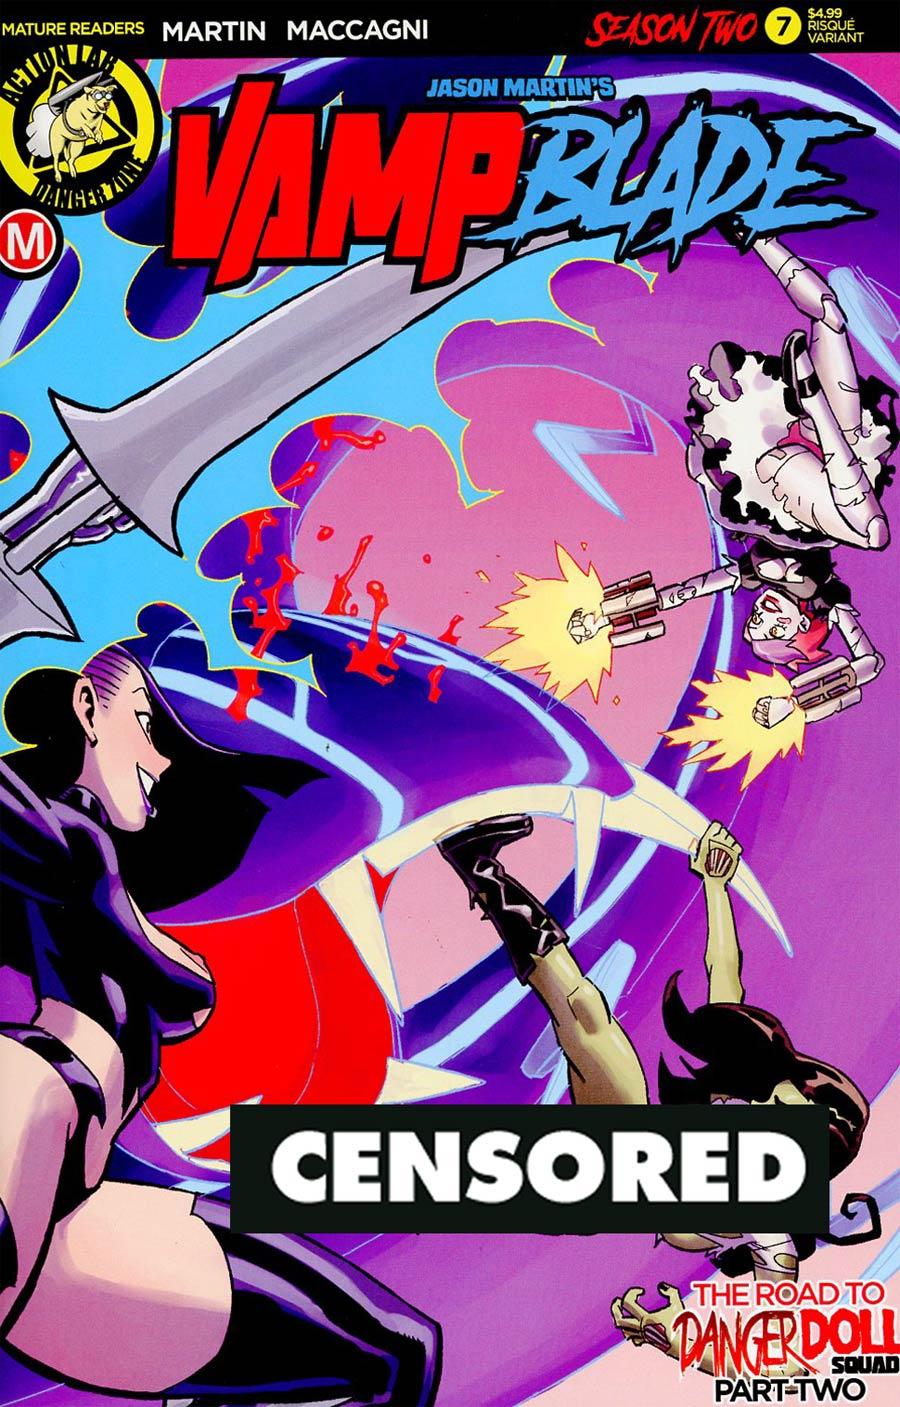 Vampblade Season 2 #7 Cover B Variant Winston Young Risque Cover